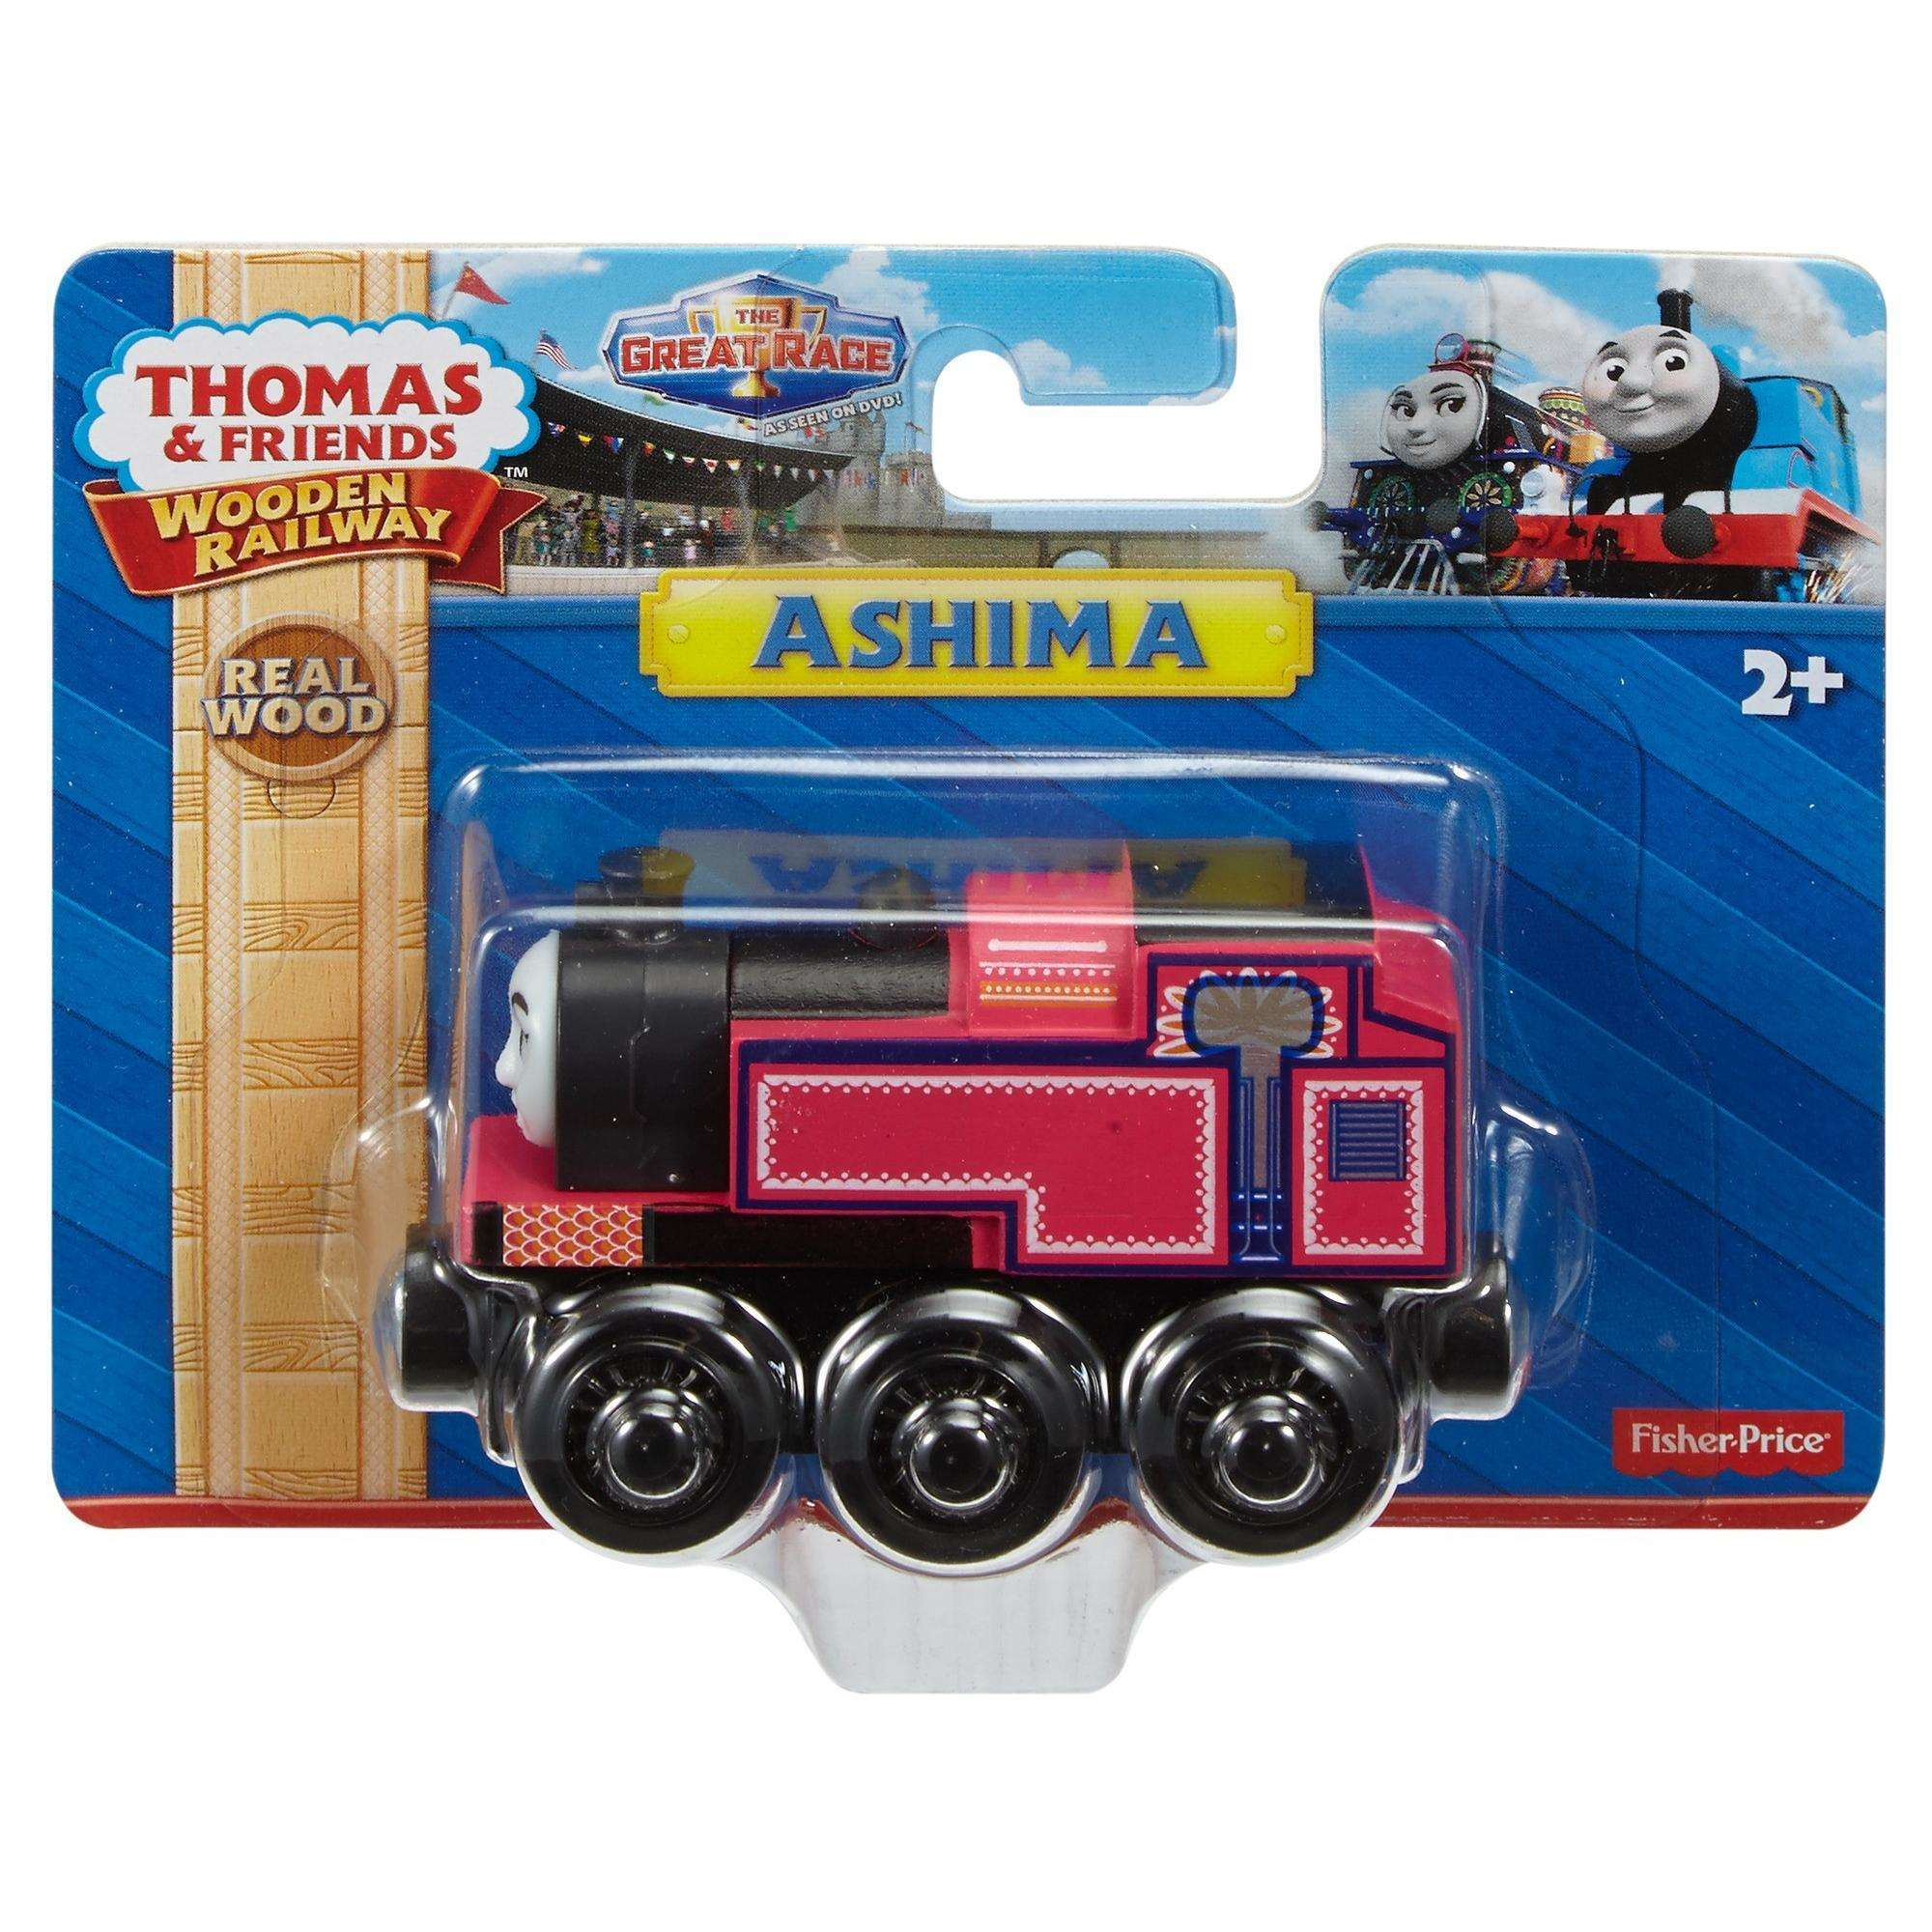 Fisher Price Thomas & Friends Wooden Railway Ashima Walmart